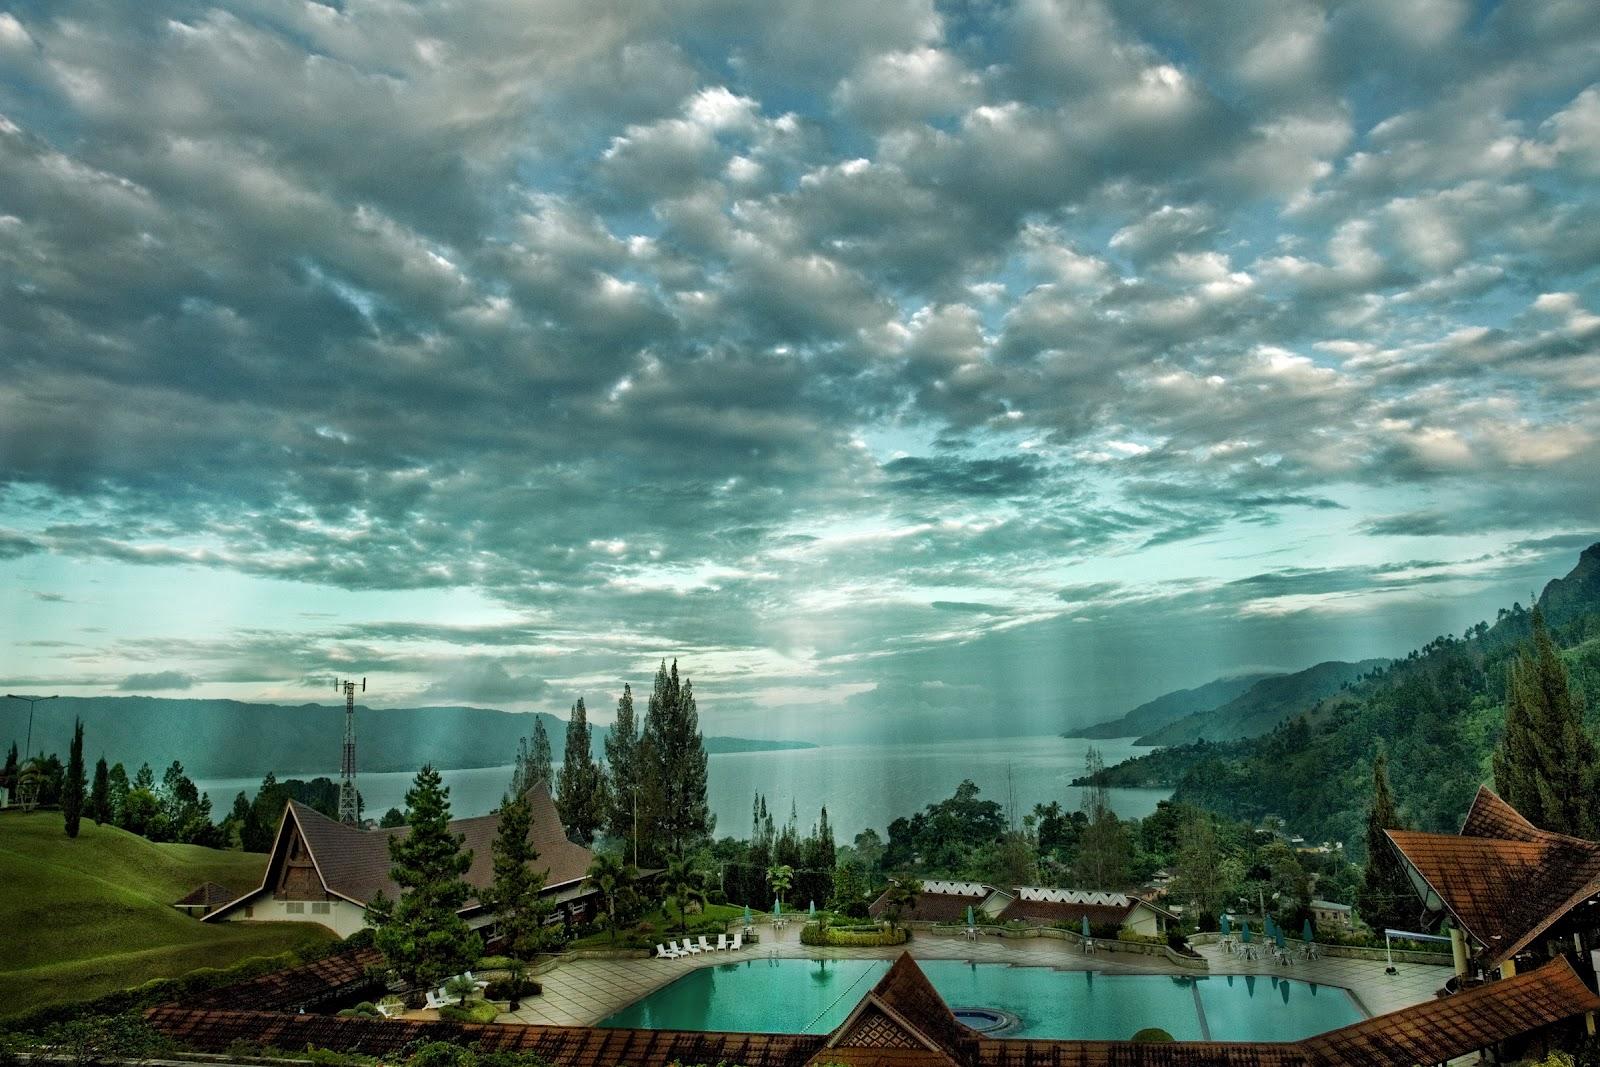 http://3.bp.blogspot.com/-L9CrOthsBFk/T9rkNFFEPfI/AAAAAAAABwc/_J1dhCAMMbI/s1600/Lake_Toba_by_nnbudum.jpg